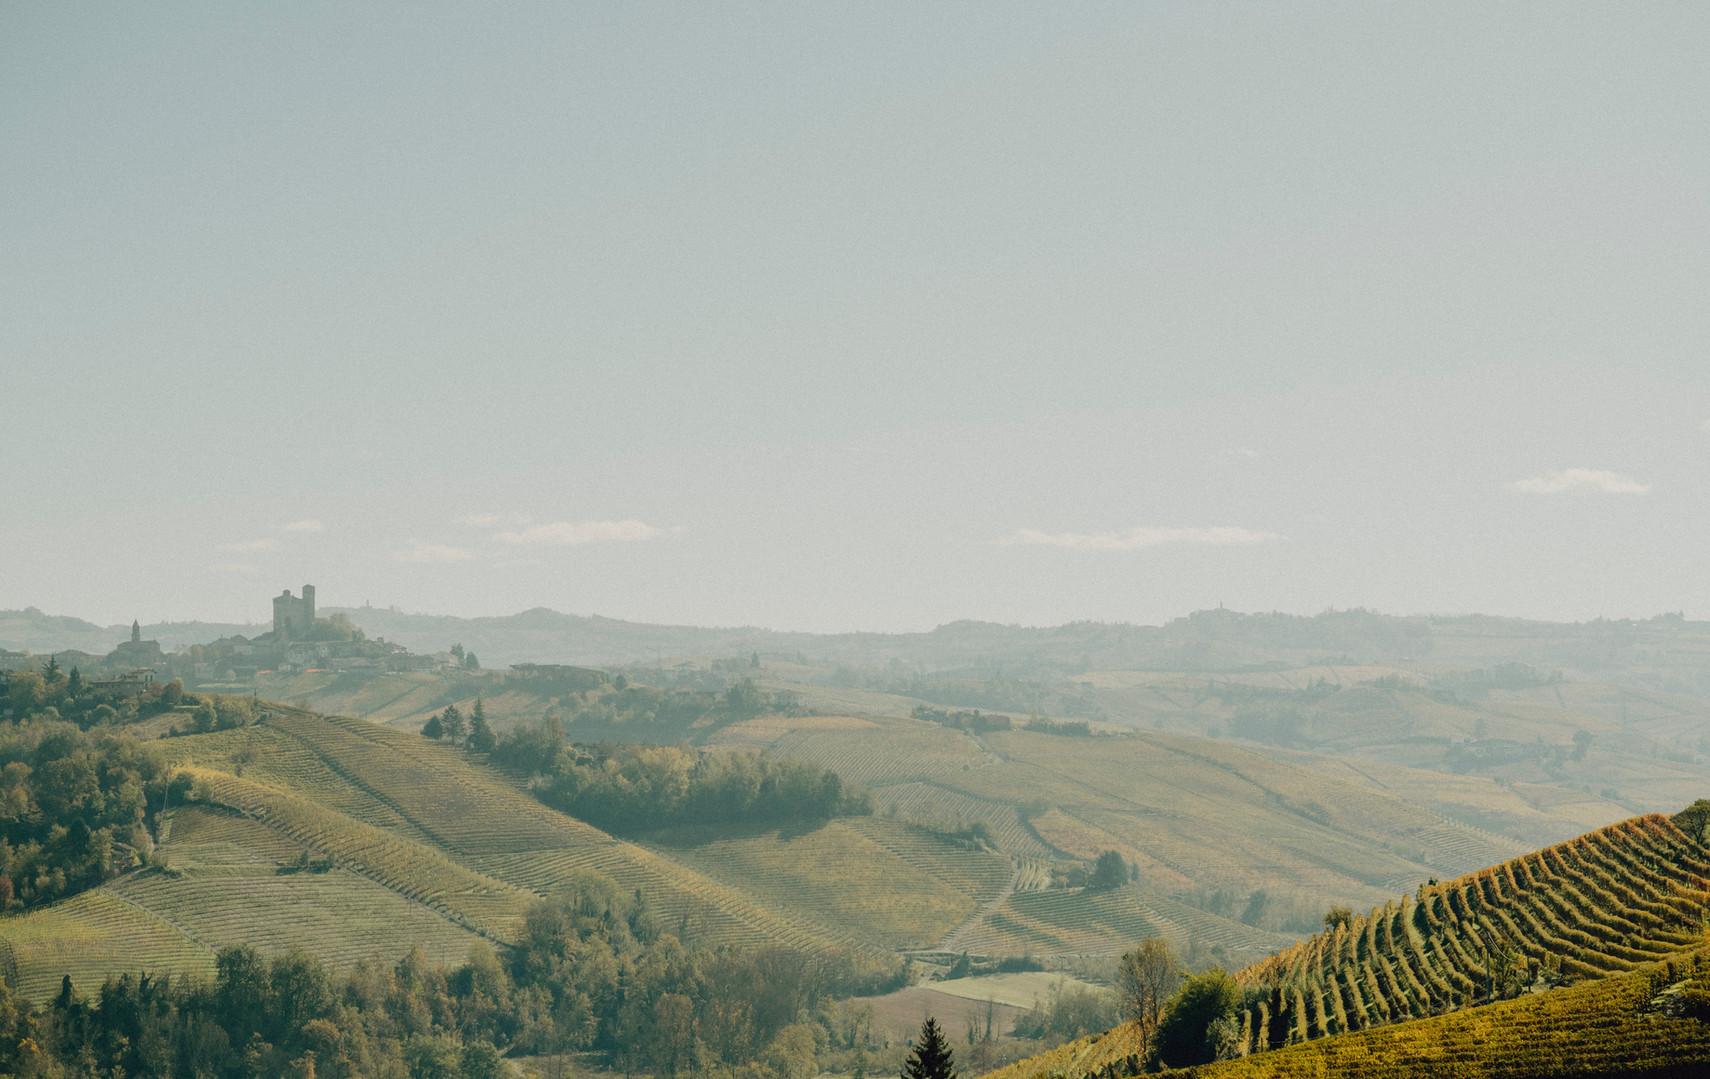 Piedmont, Langeh Region of Italy